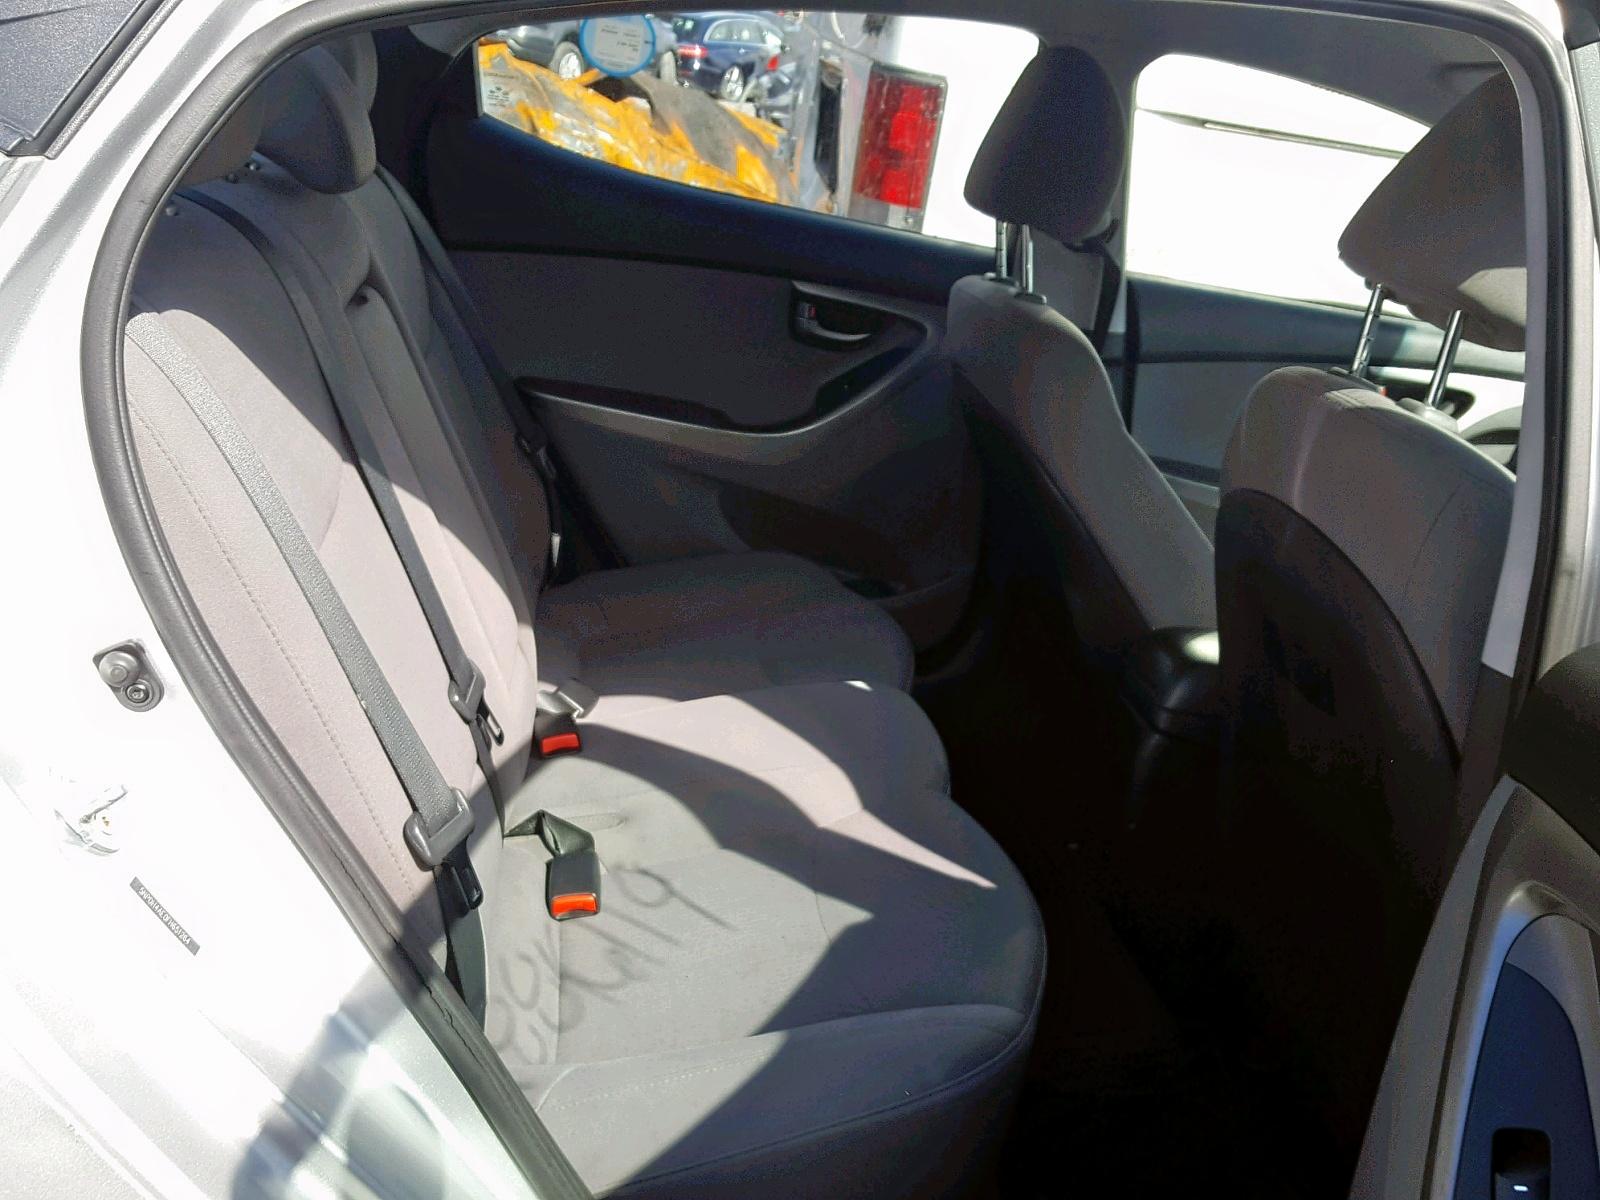 2015 Hyundai Elantra Se 1.8L detail view